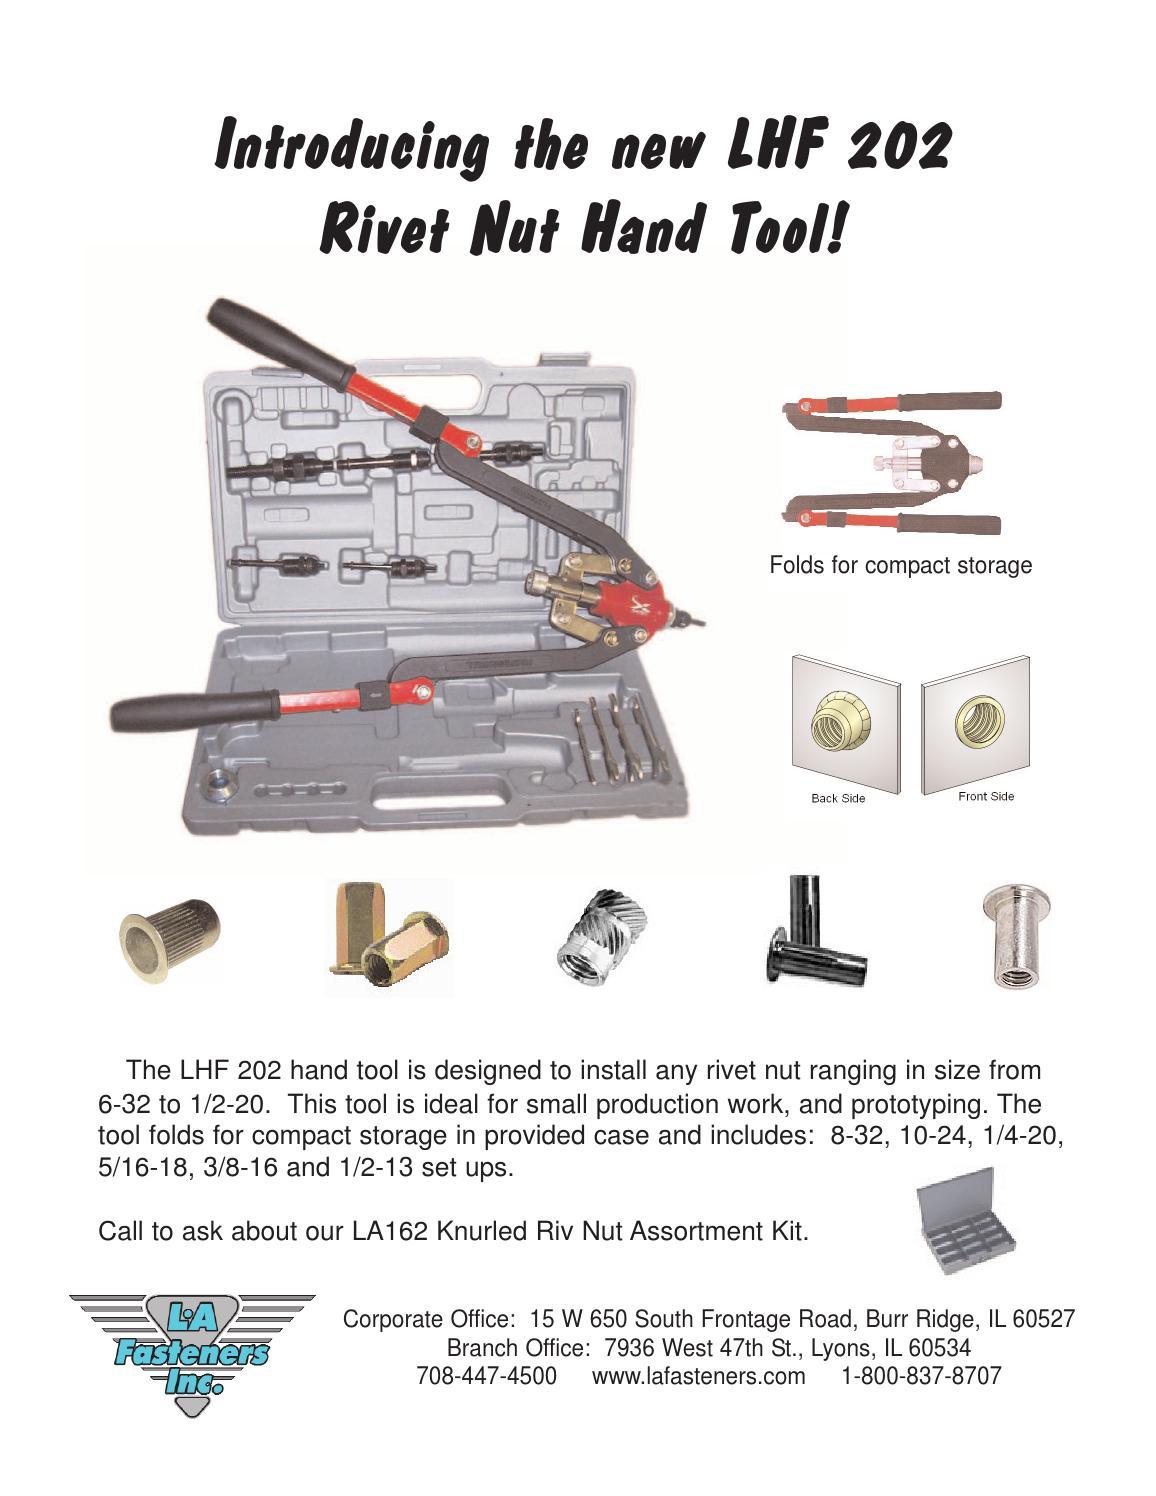 Lhf 202 rivet tool flyer by lafasteners com - issuu